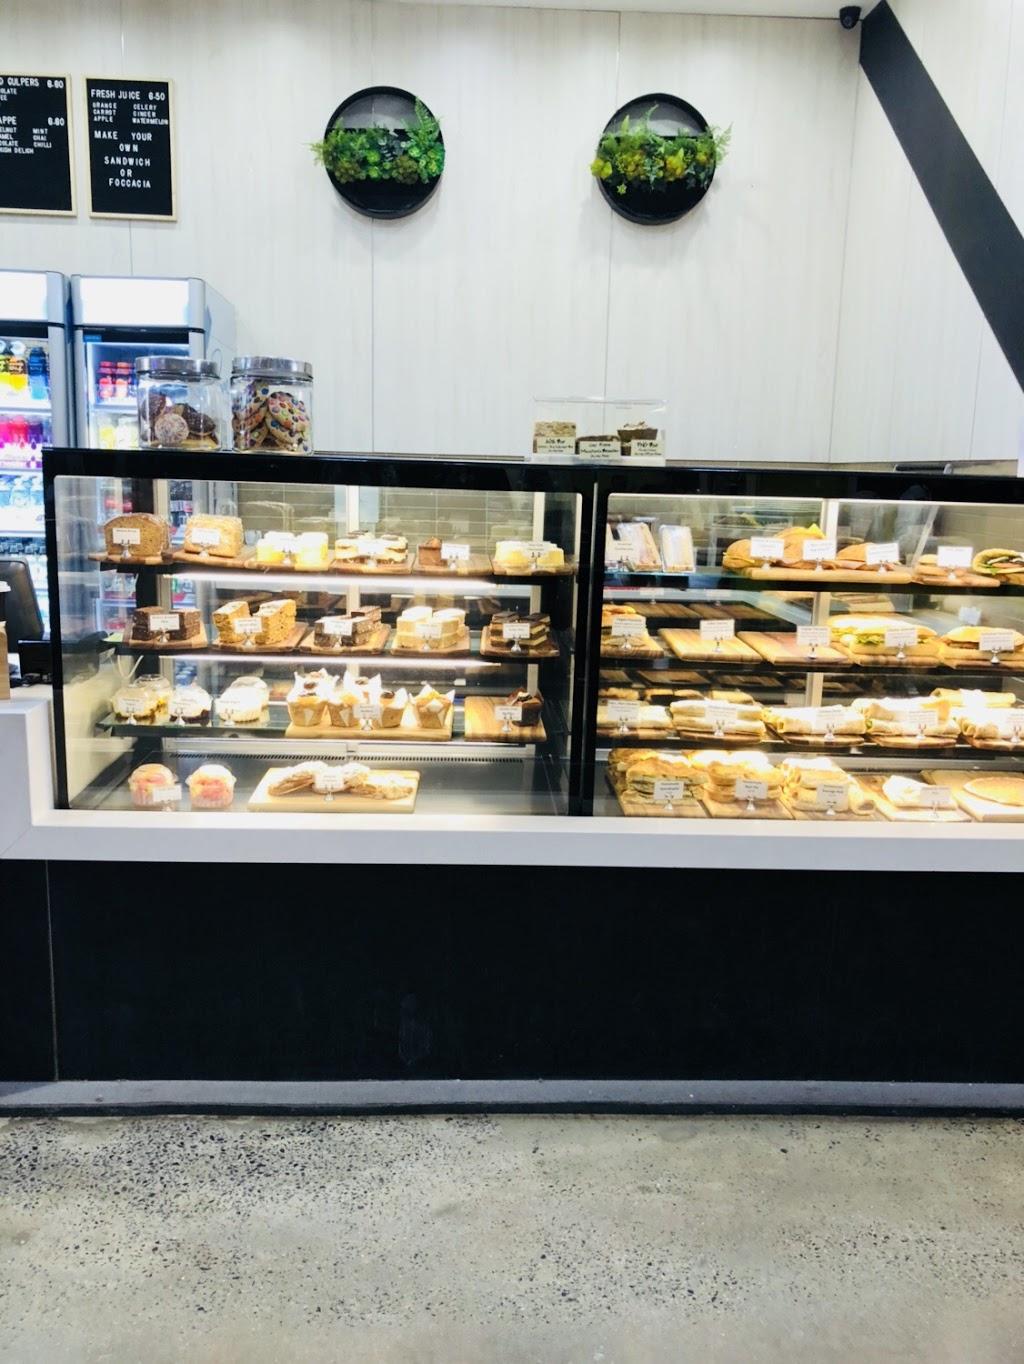 Killer Coffee | cafe | Uni Hill Outlet Mall Food Court, Bundoora VIC 3083, Australia | 0394678899 OR +61 3 9467 8899